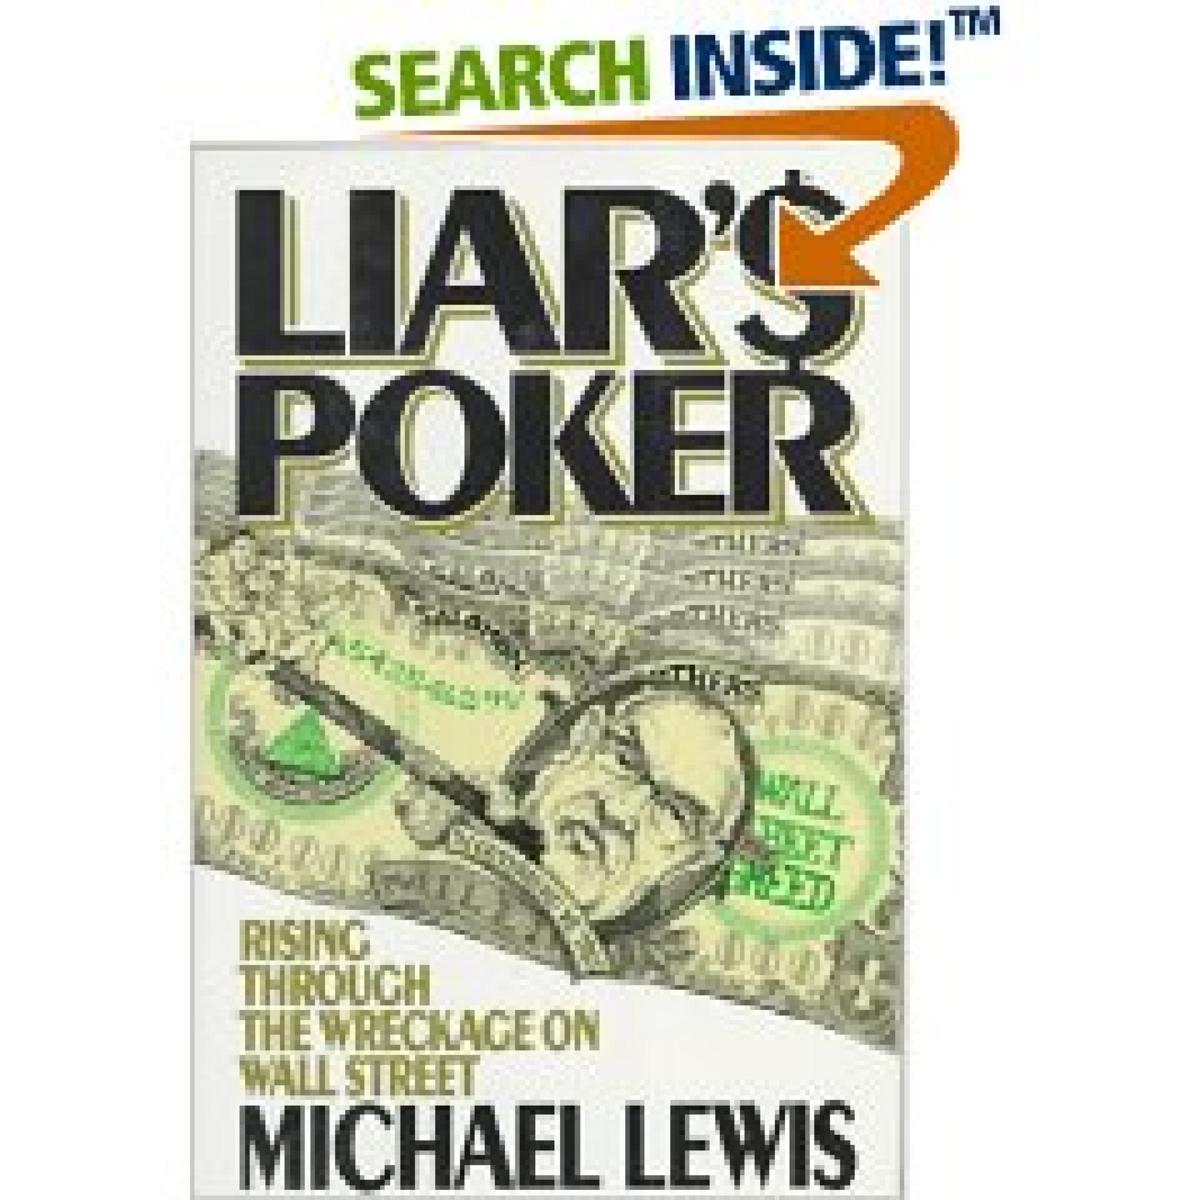 Liar poker million dollar bet on silver nj sports betting referendum grecia